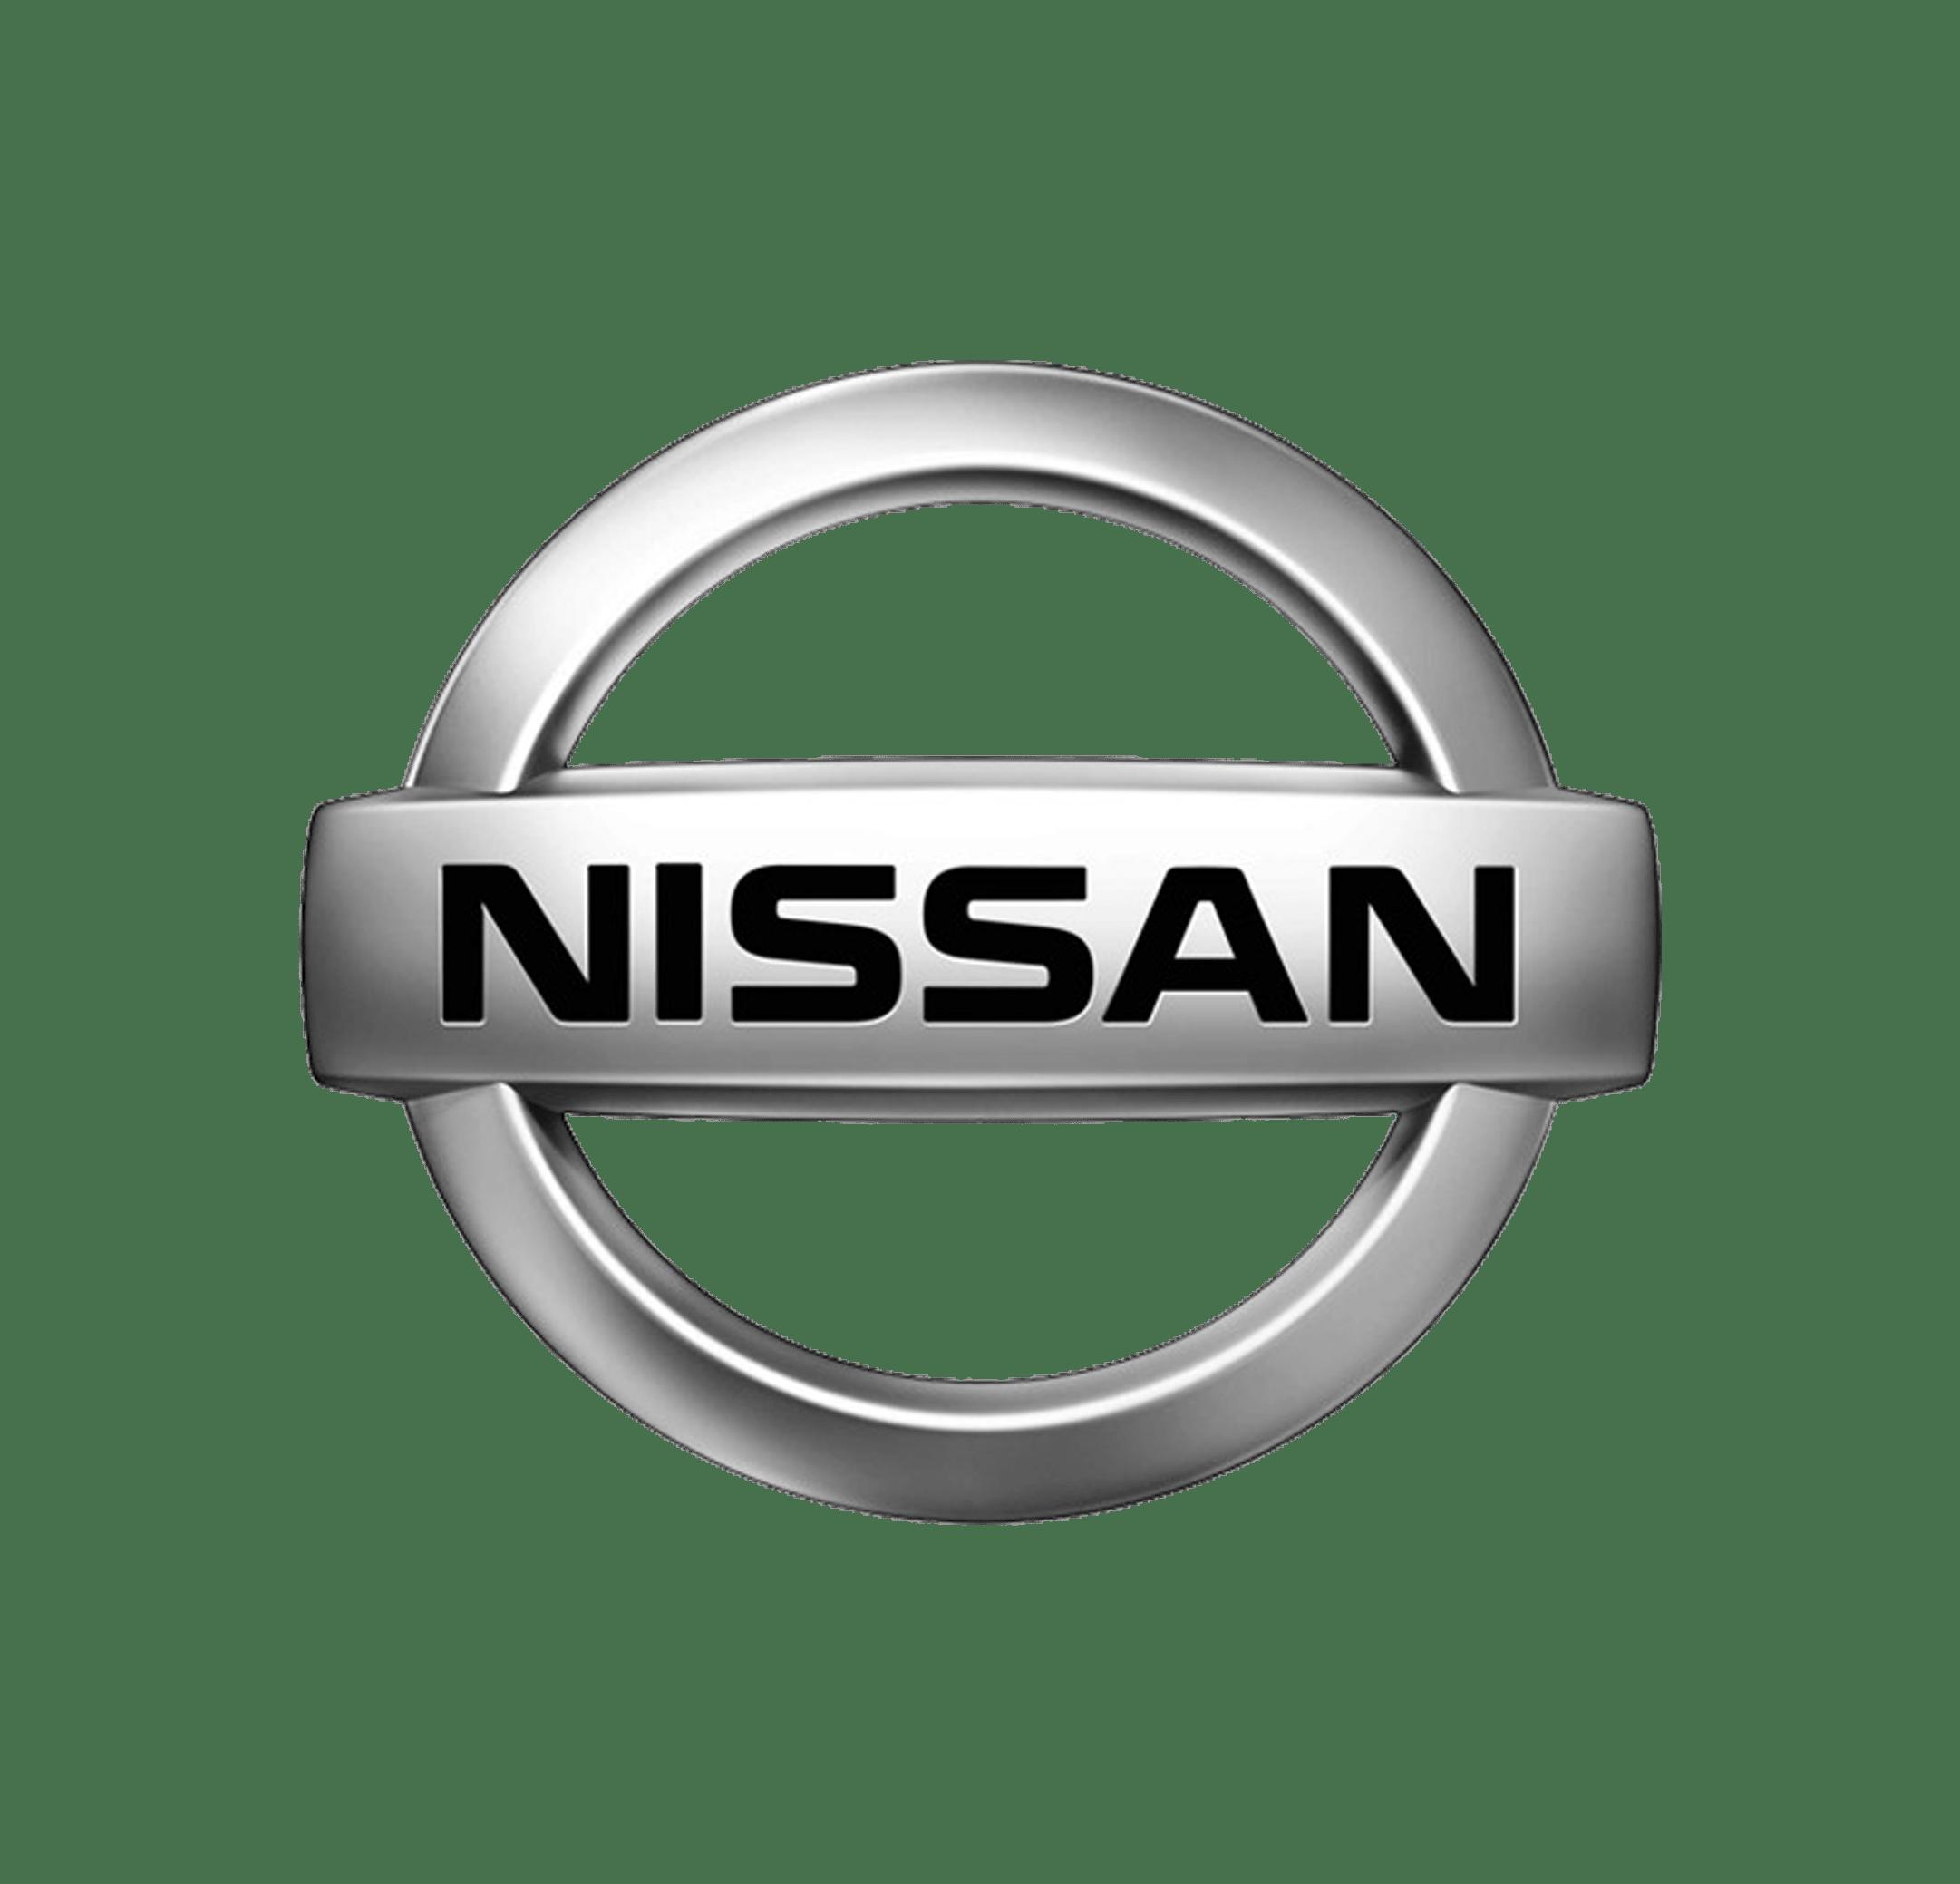 NISSAN-min.png